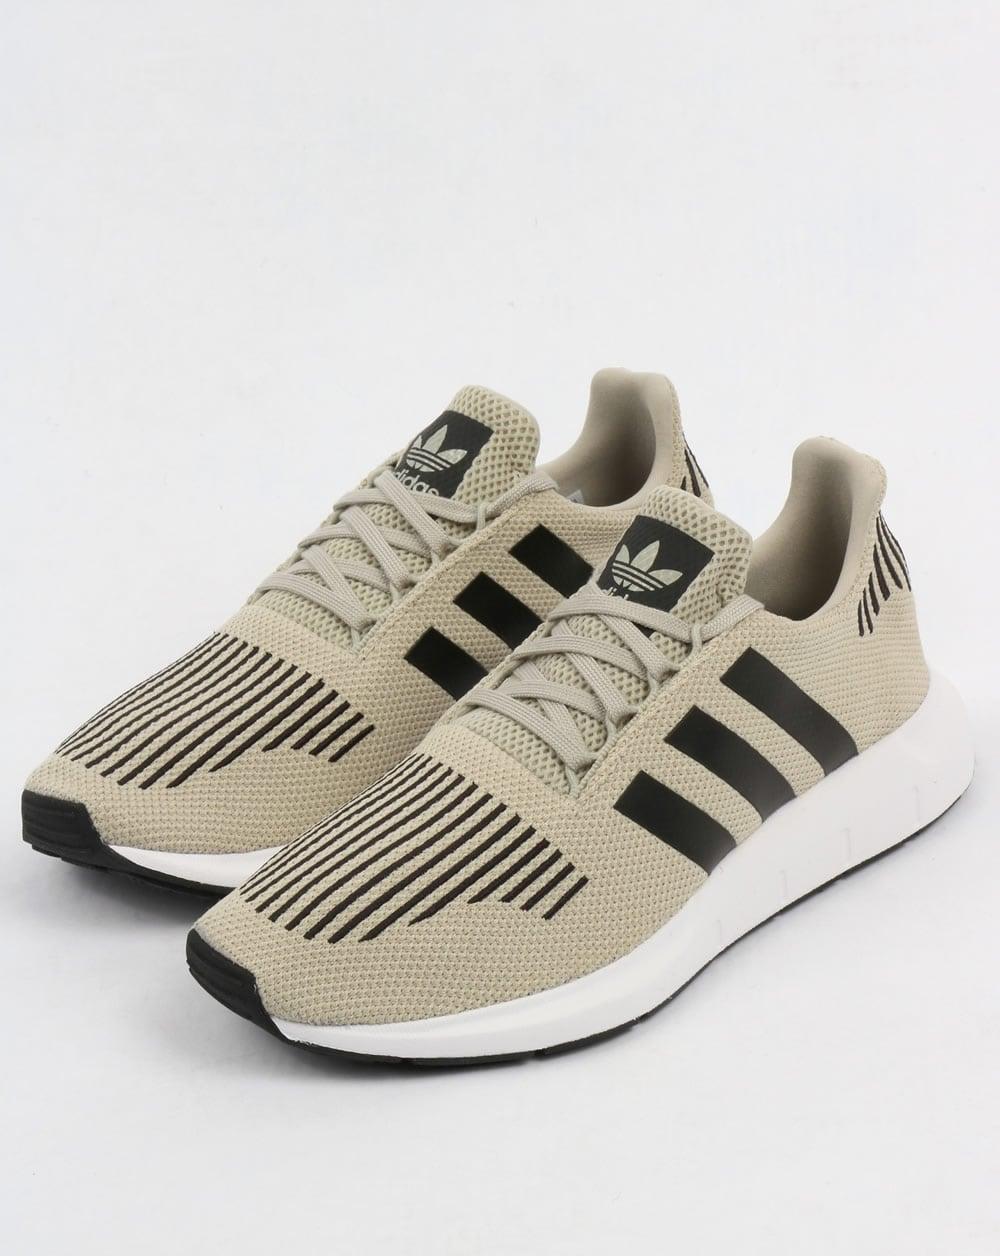 Adidas Swift Run Trainers Sesame/Black